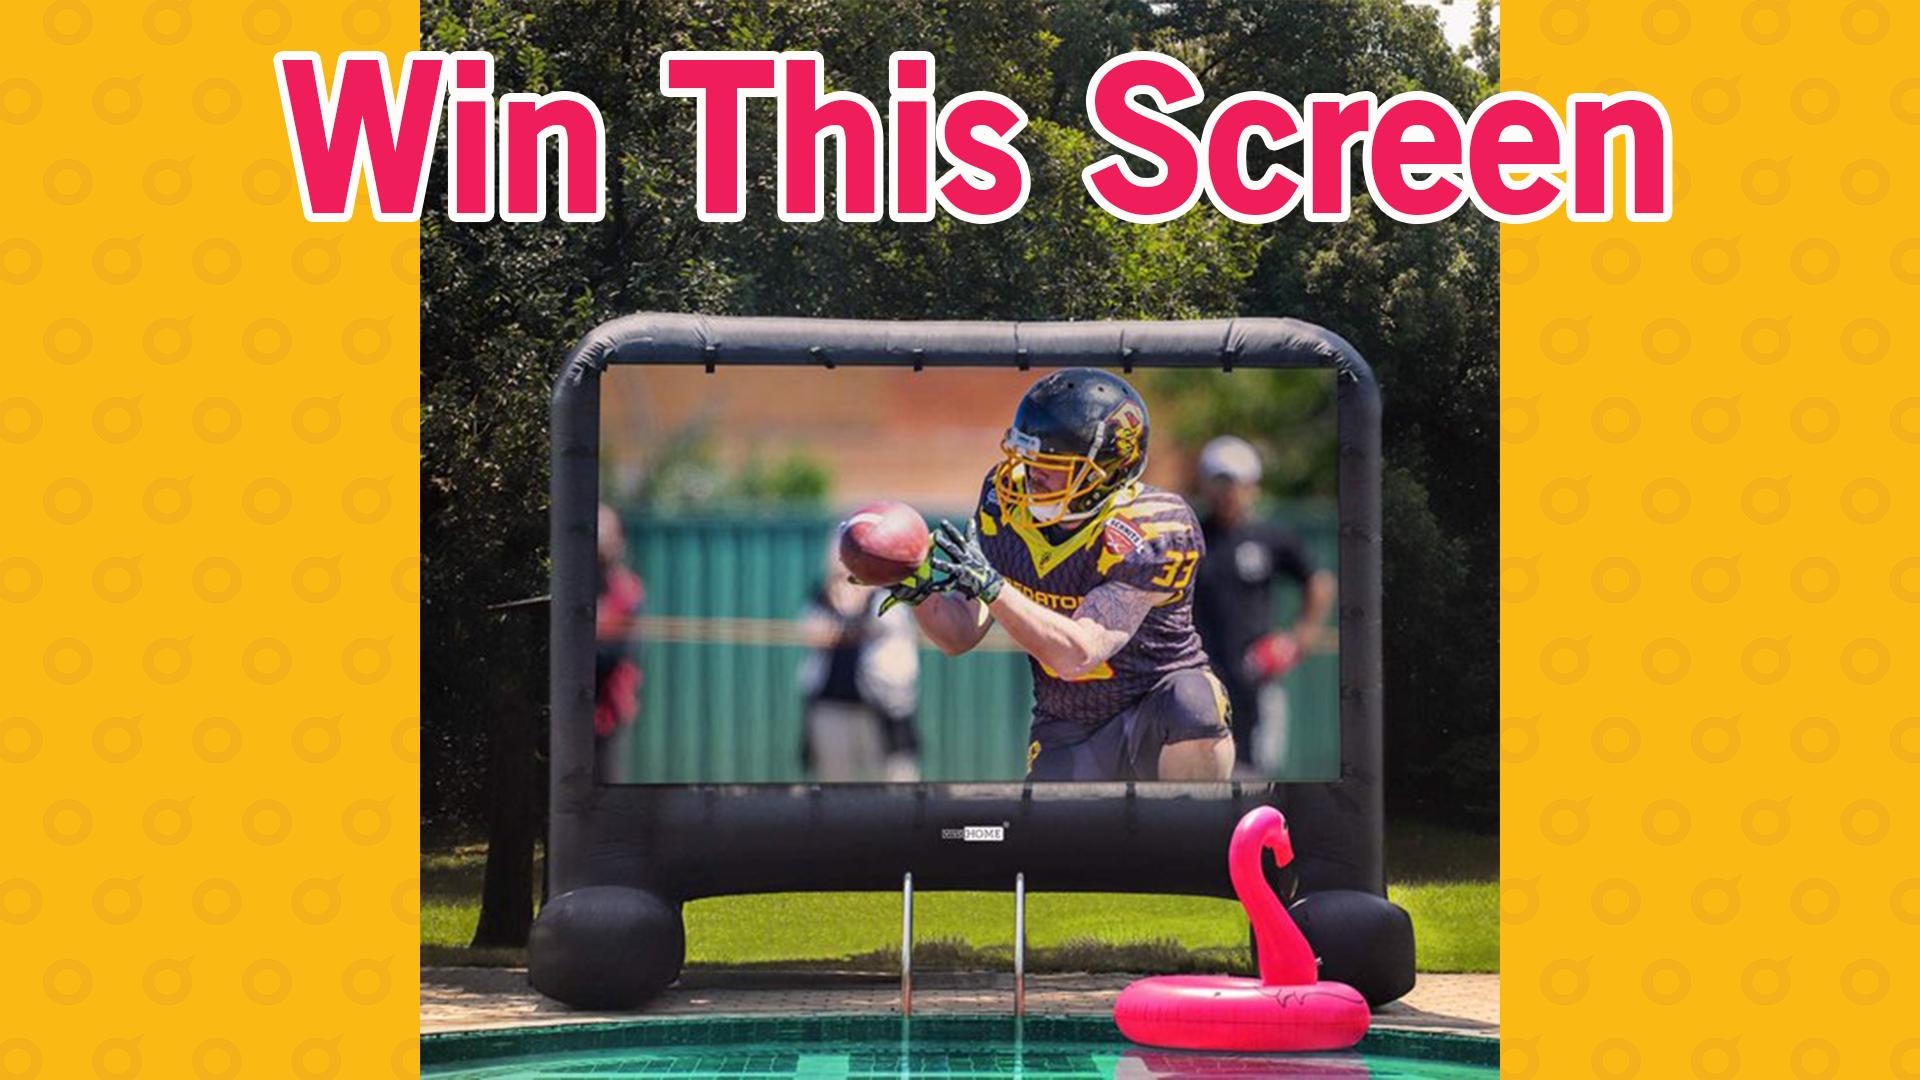 winthisscreen2